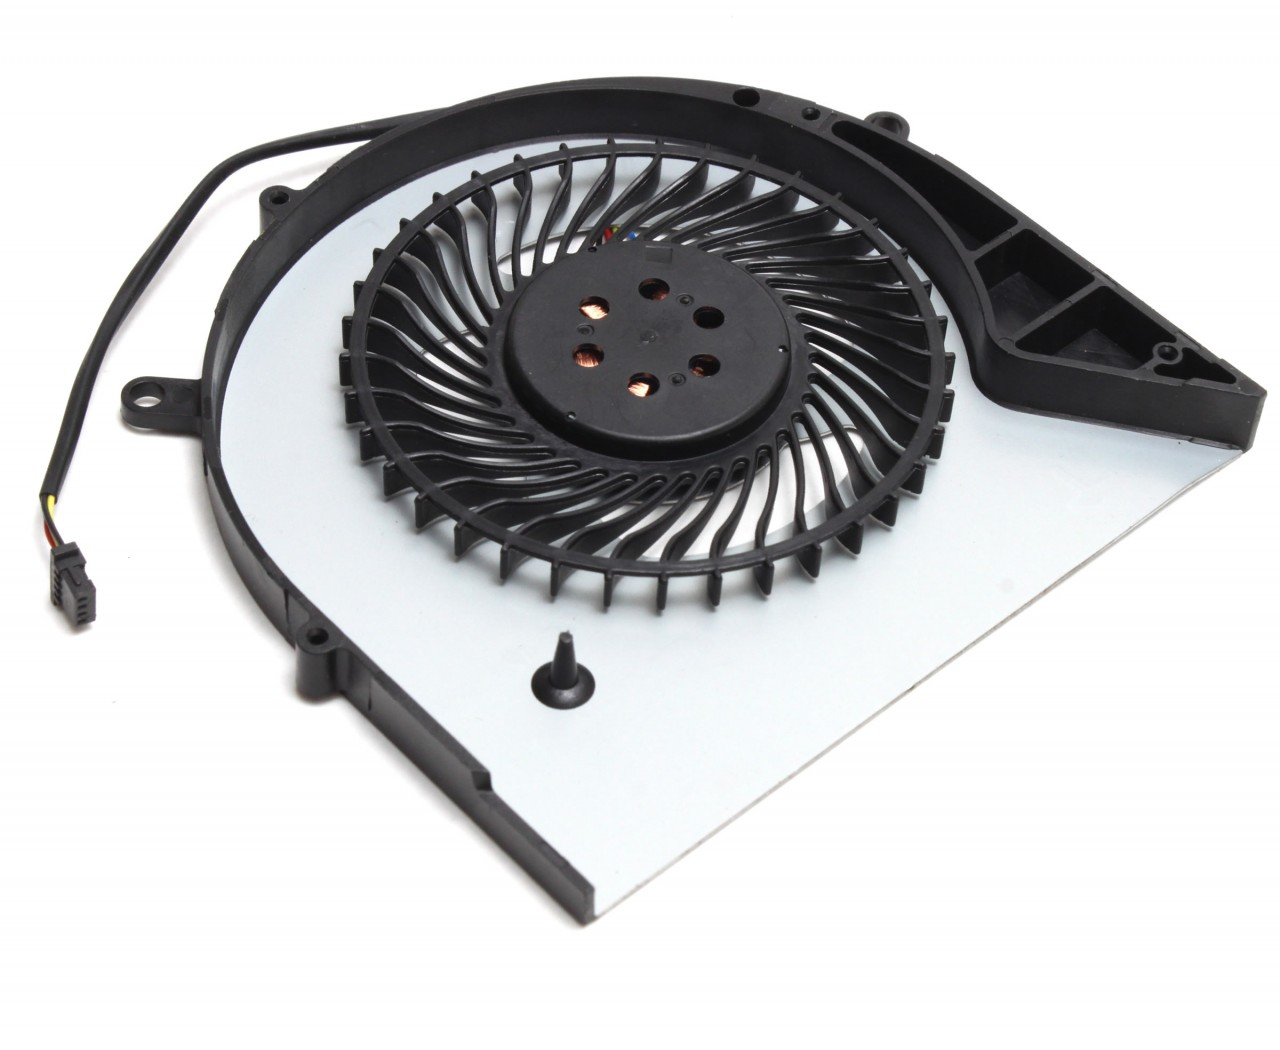 Cooler placa video laptop GPU Asus GL503VM imagine powerlaptop.ro 2021